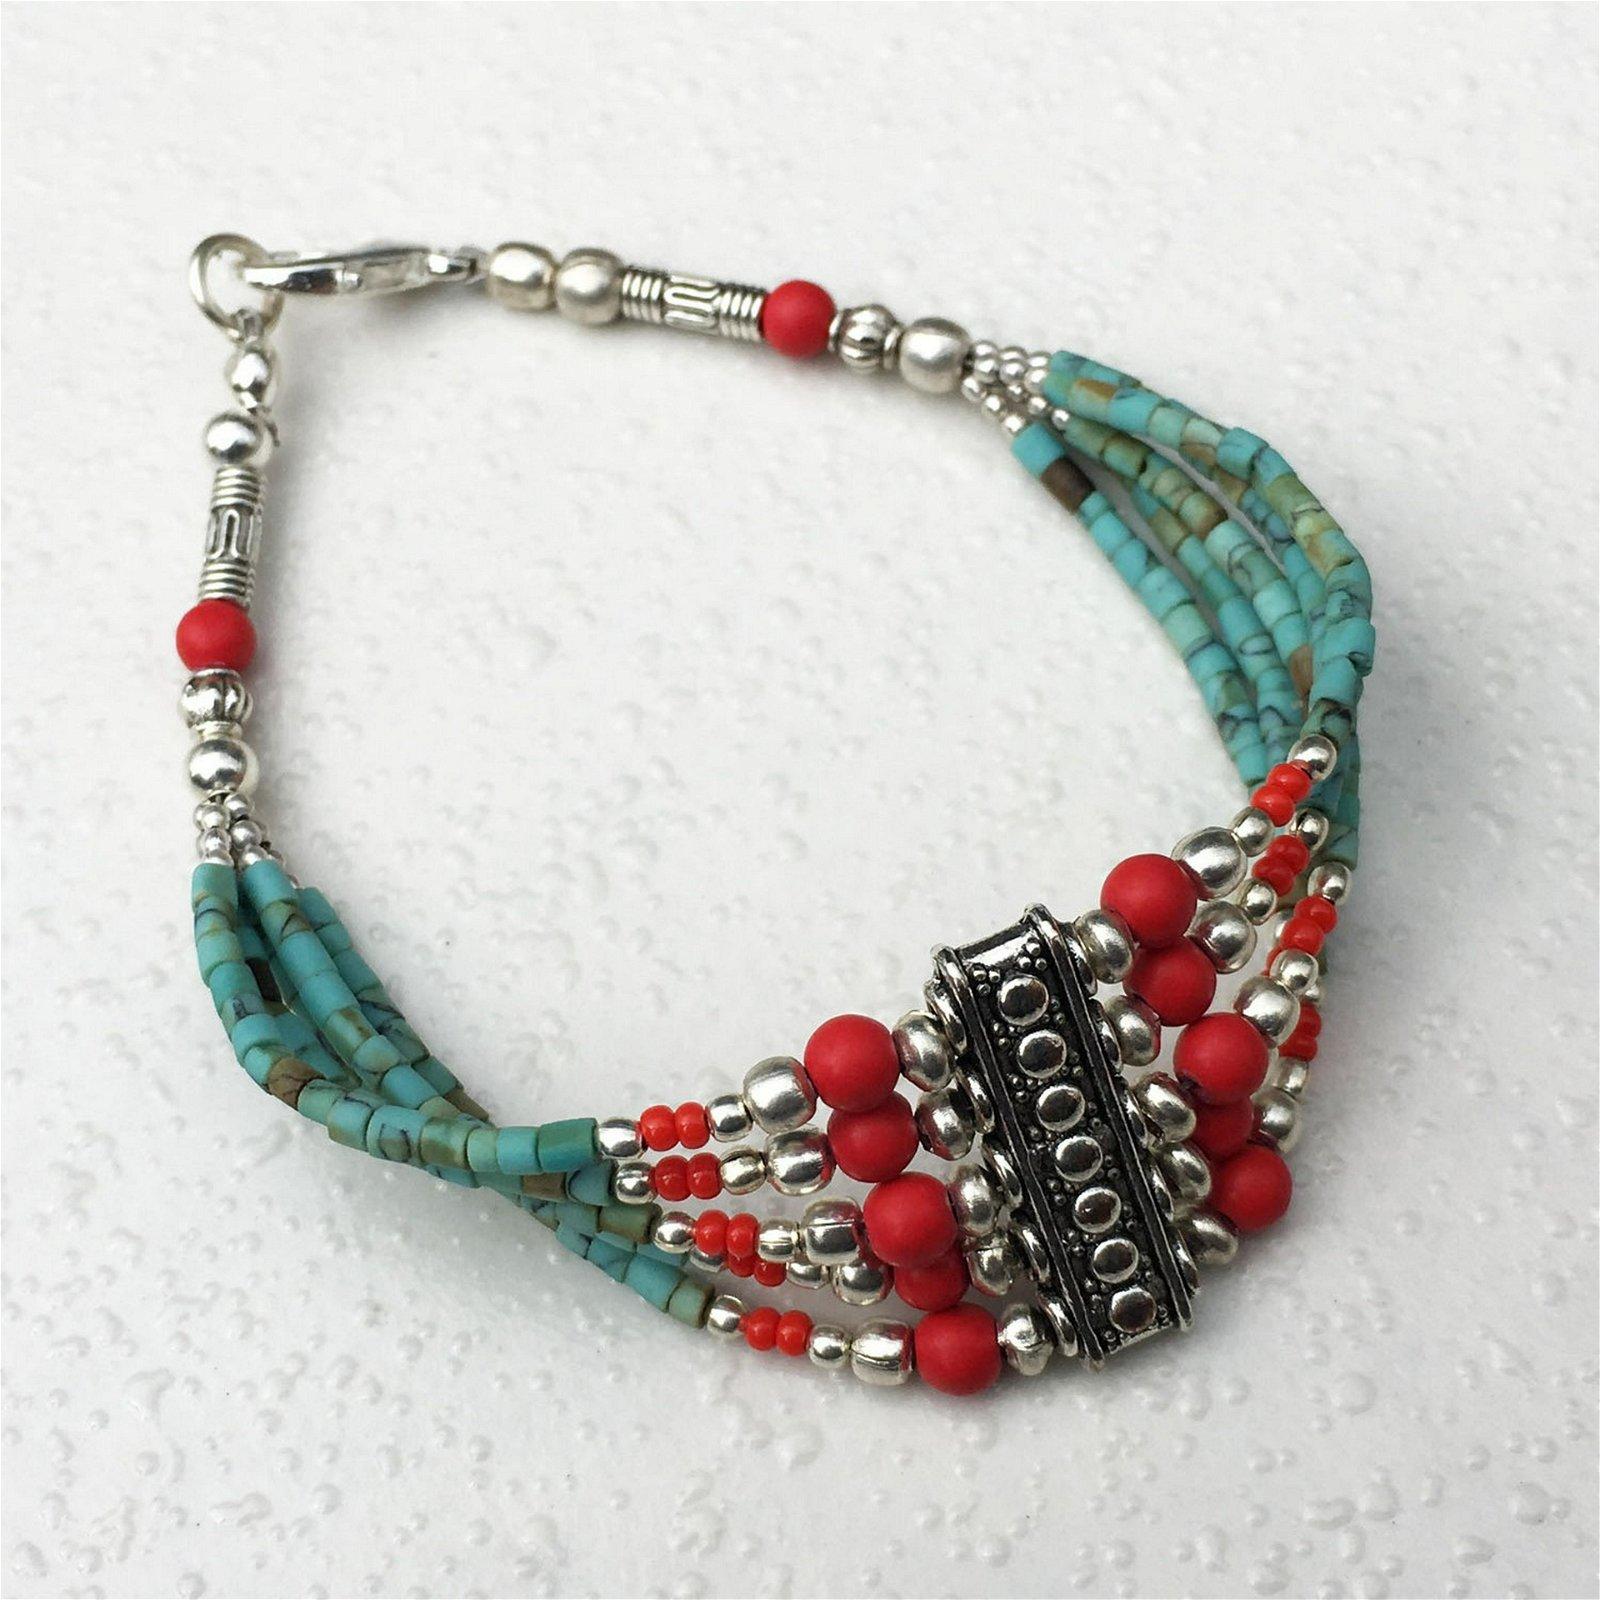 Tibetan Turquoise & Coral Beaded Charm Bracelet